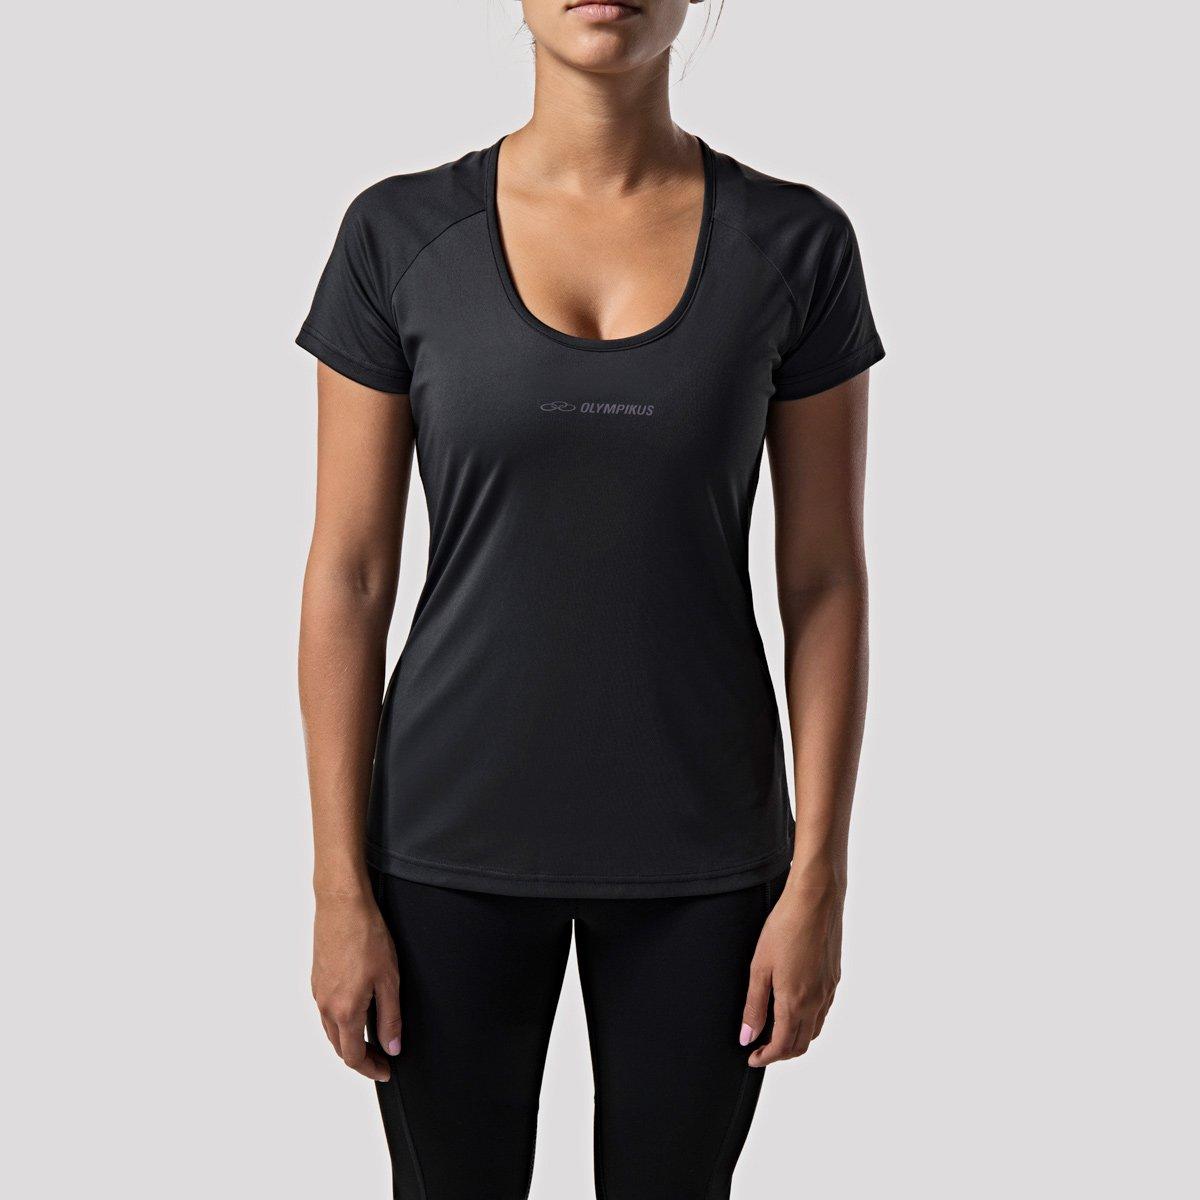 Camiseta Olympikus Runner Camiseta Feminina Preto Camiseta Preto Olympikus Runner Olympikus Feminina rrwpaqdR